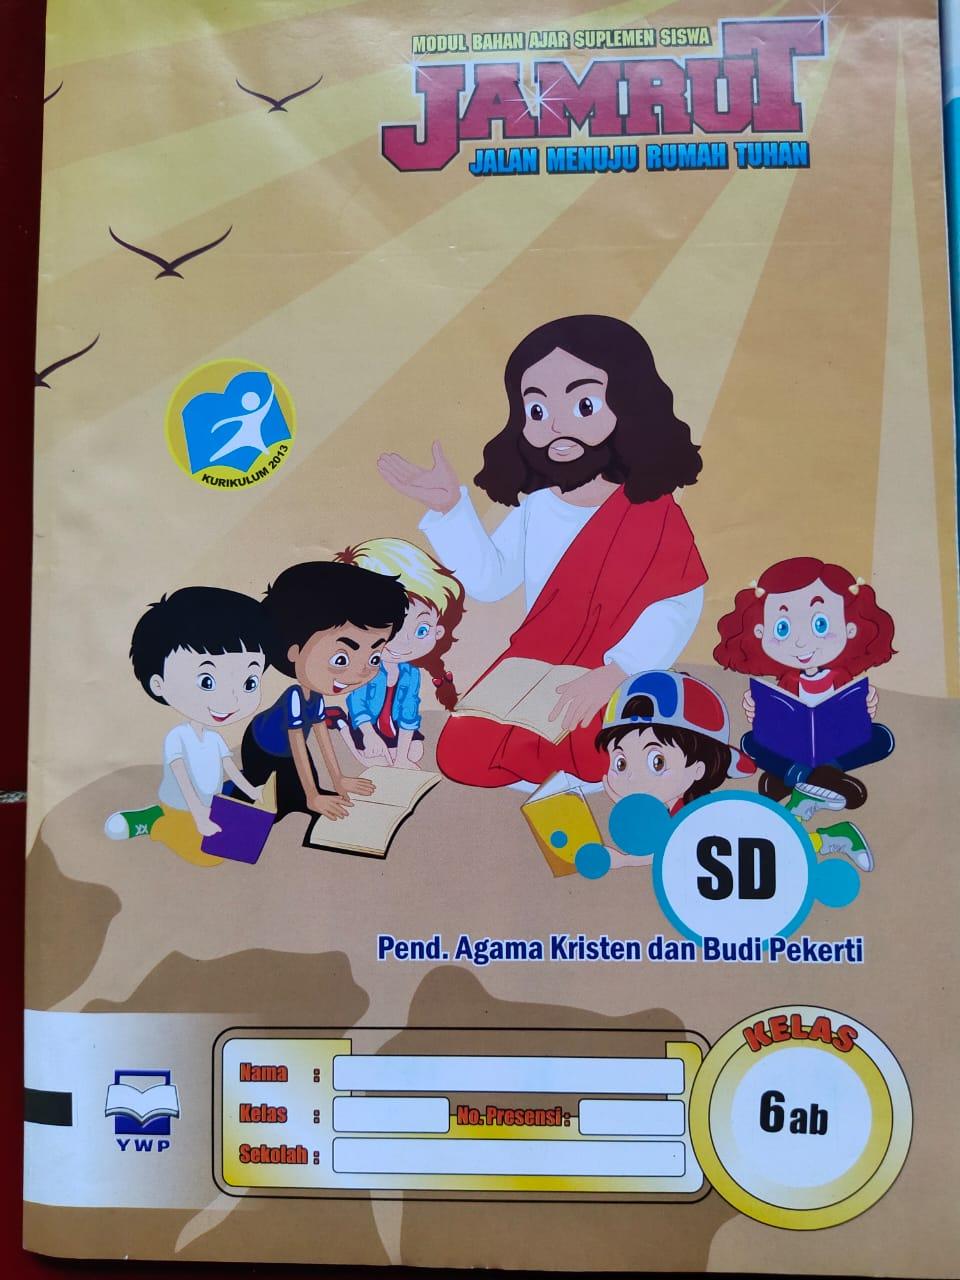 Distributor Supplier Jual Lks Sd K13 Agama Kristen Kelas 6 Semester 1 Dan 2 Merk Jamrut Best Choice Book Store